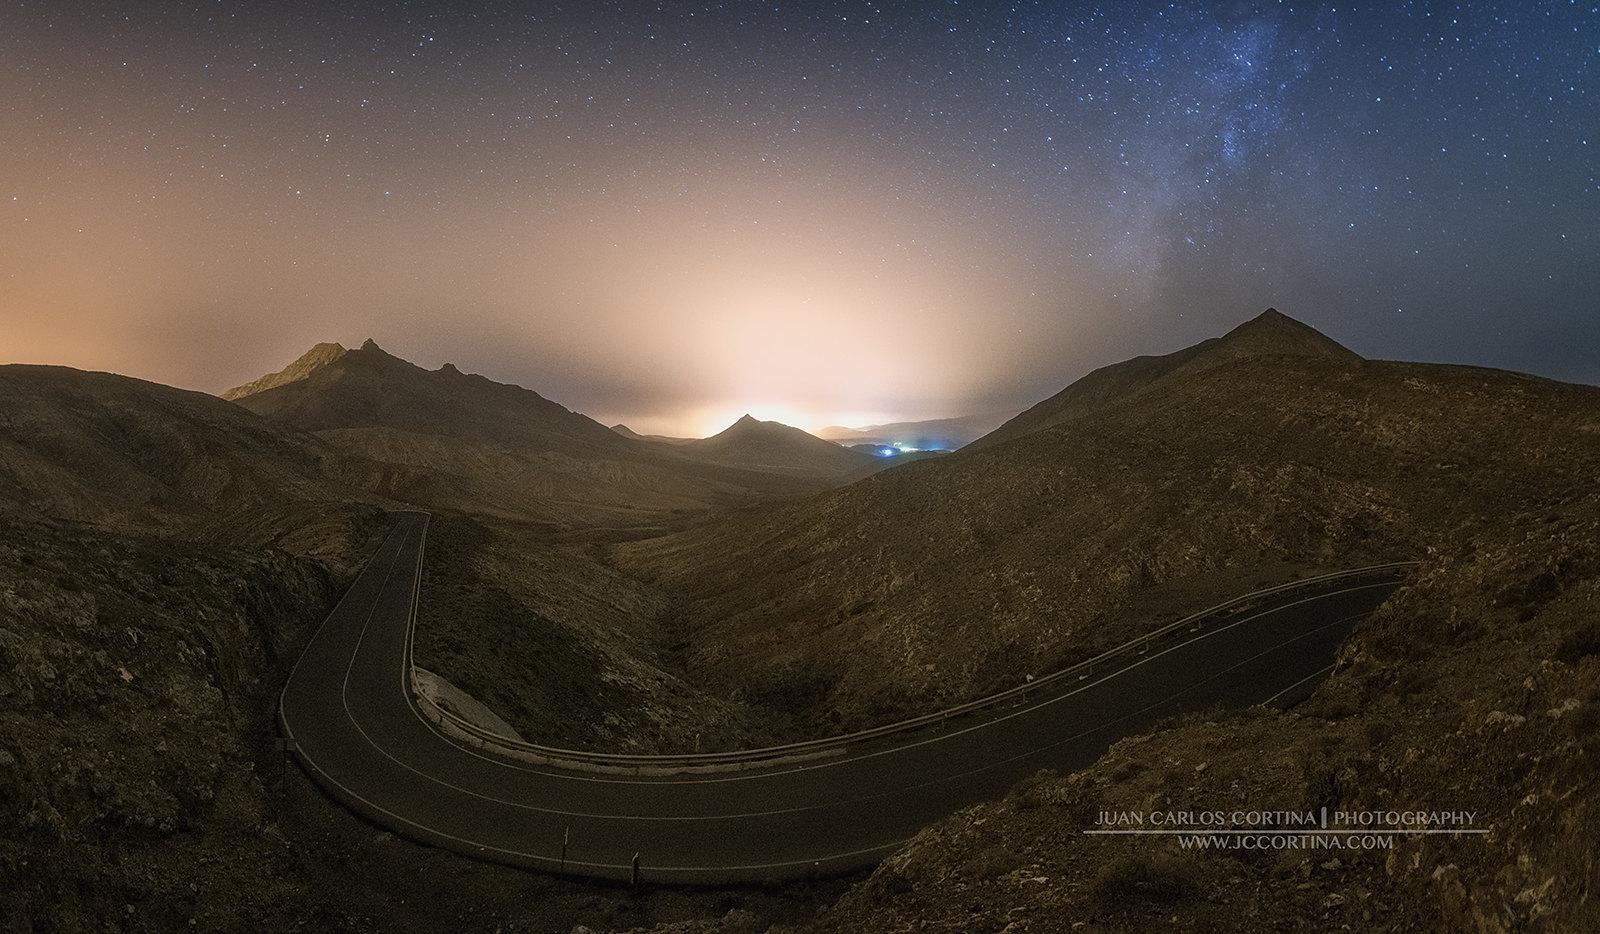 Carretera en Marte. Fuerteventura.